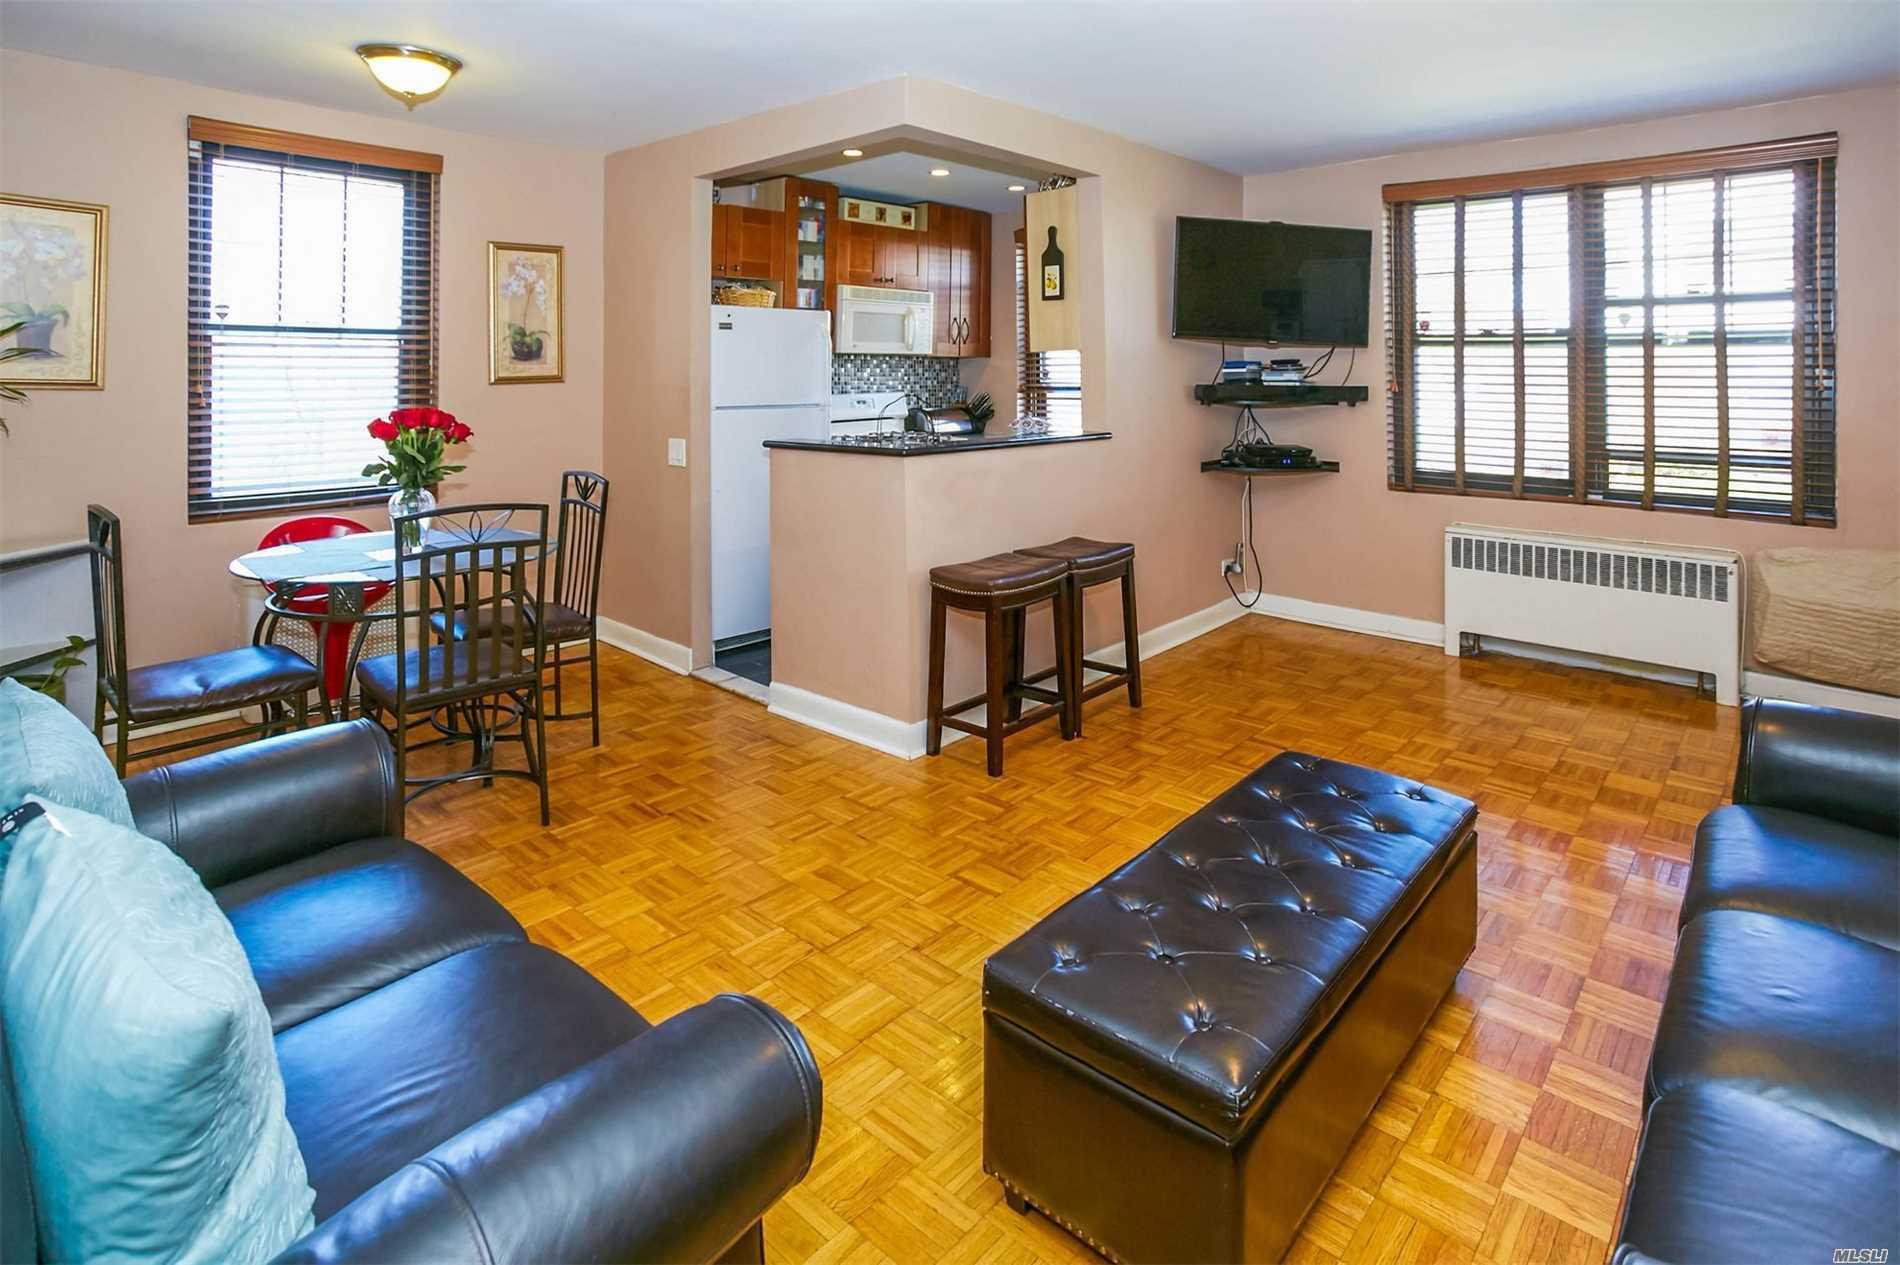 Listing: 69-97a Park Drive East, Kew Garden Hills, NY.| MLS# 3024551 ...